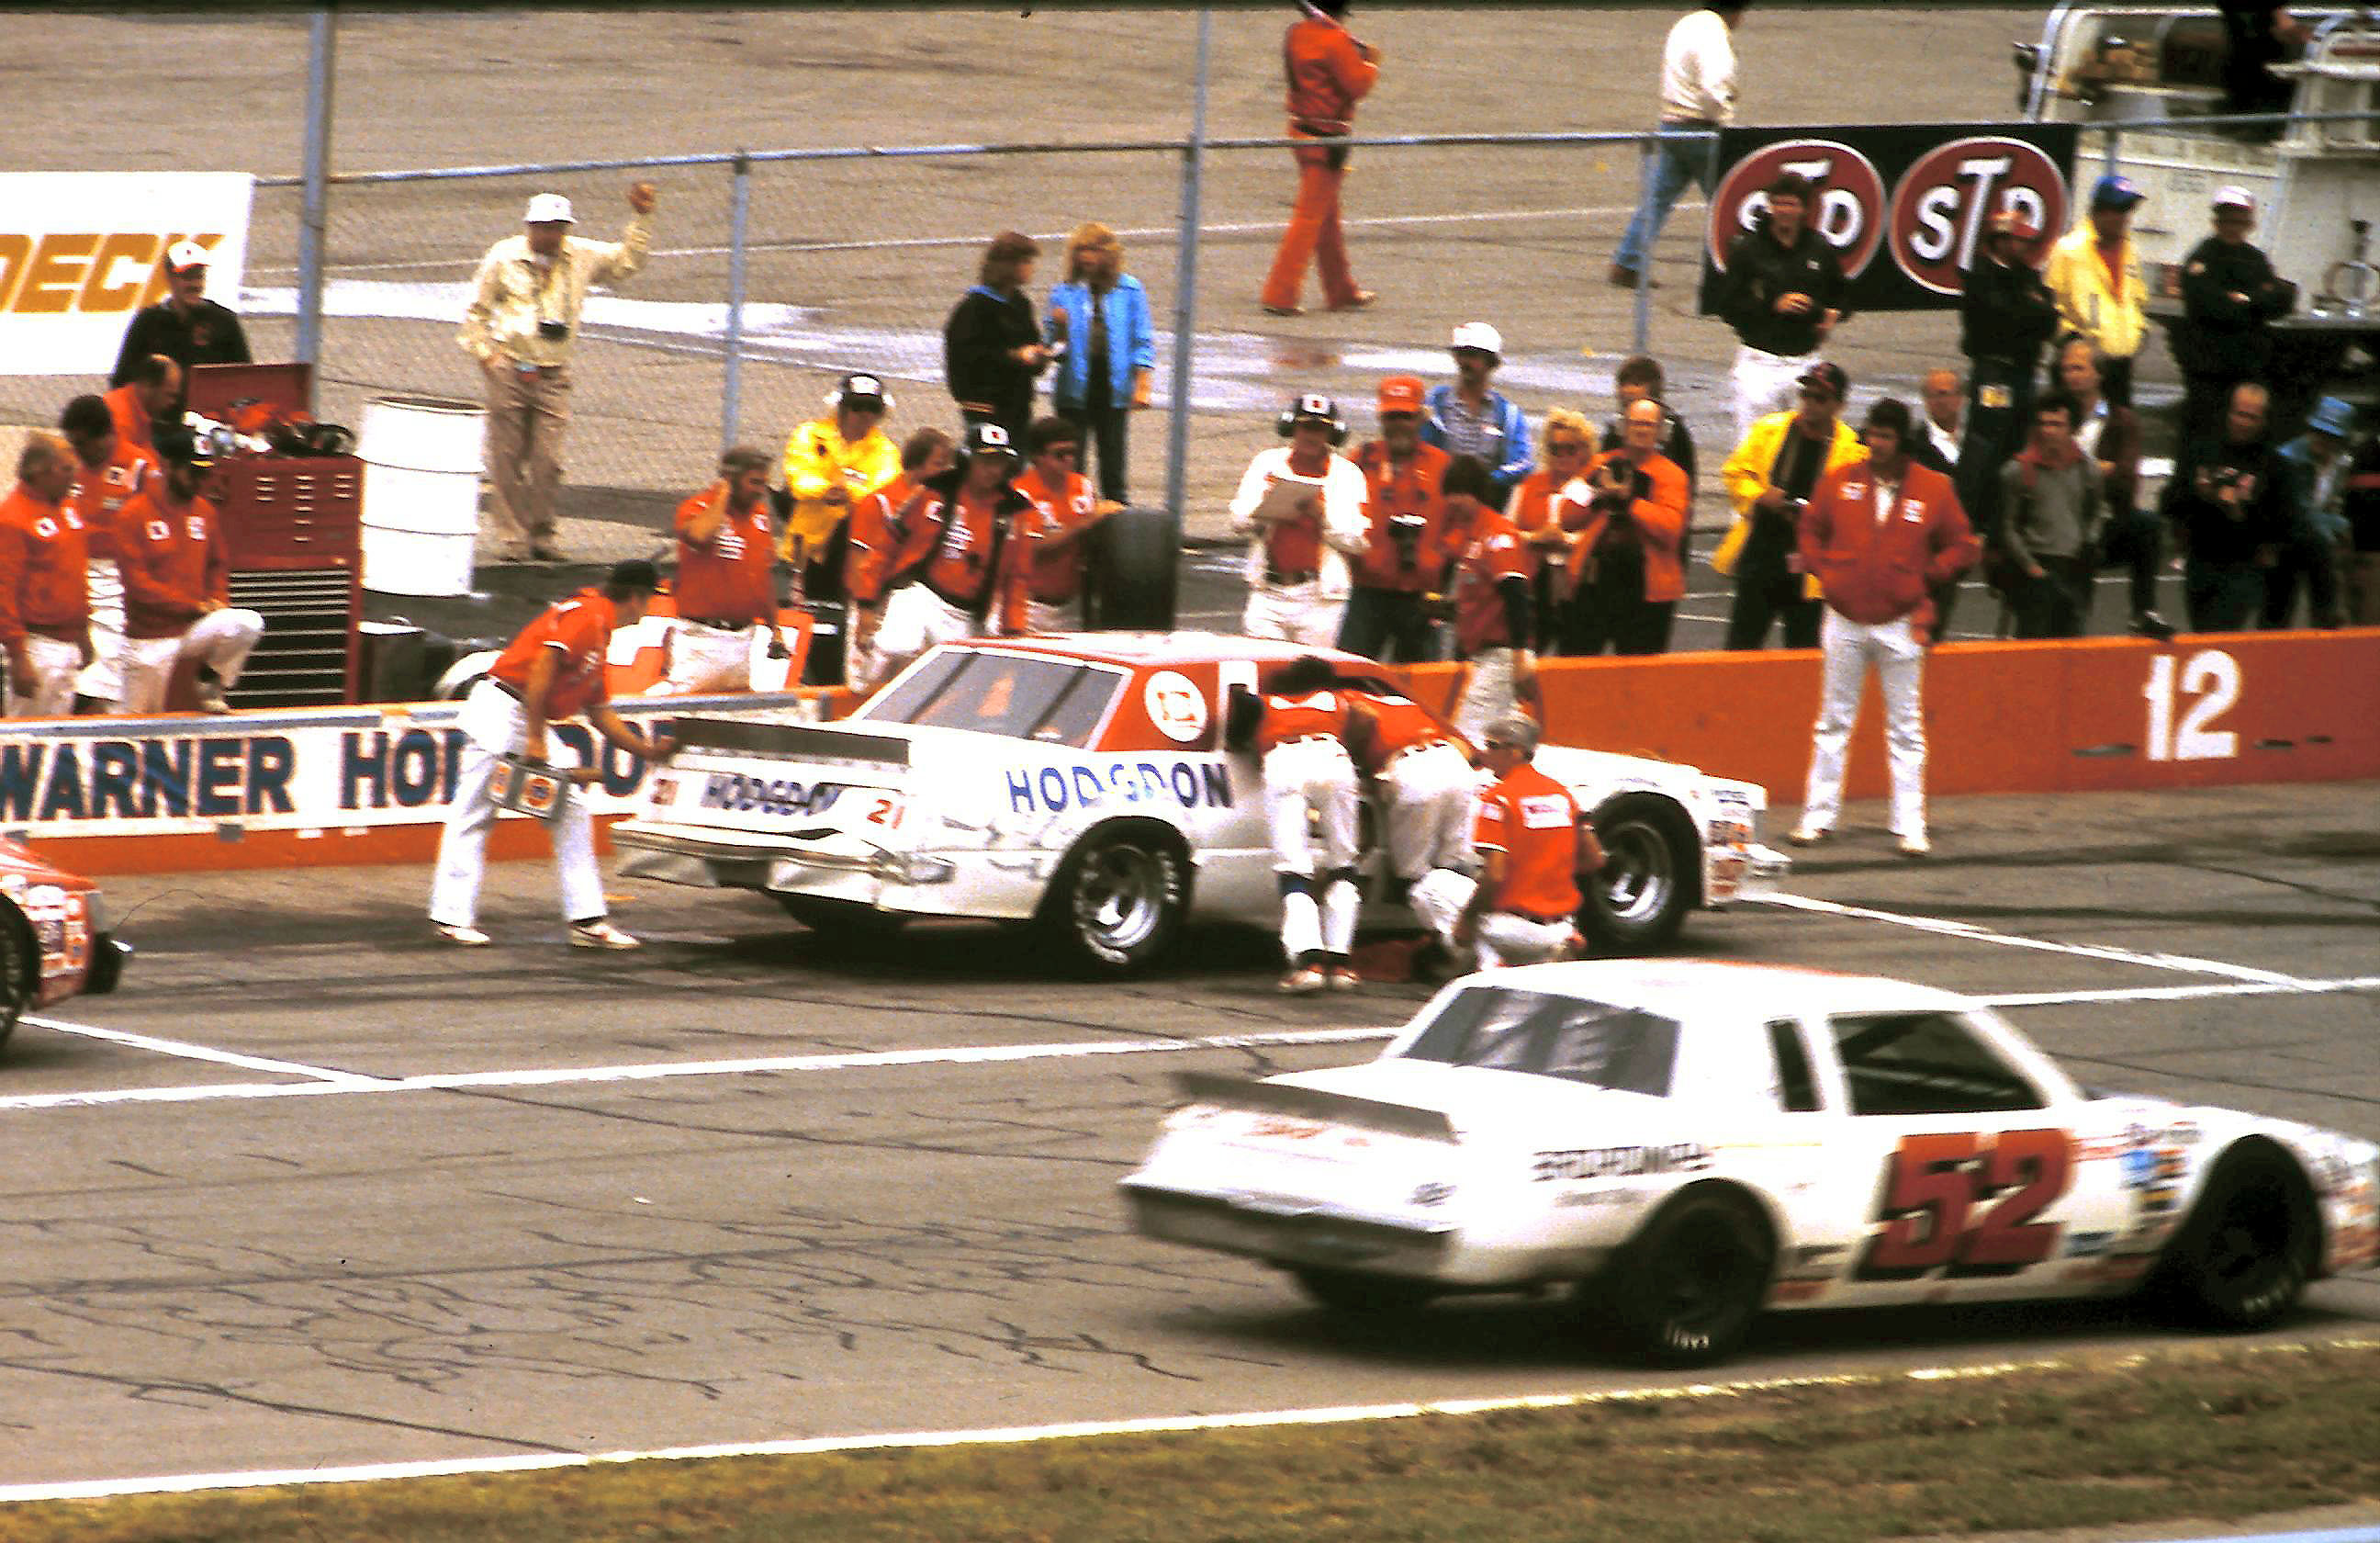 Buick Regal 1982 #52 Jimmy Means Broadway motor  811876B1981522